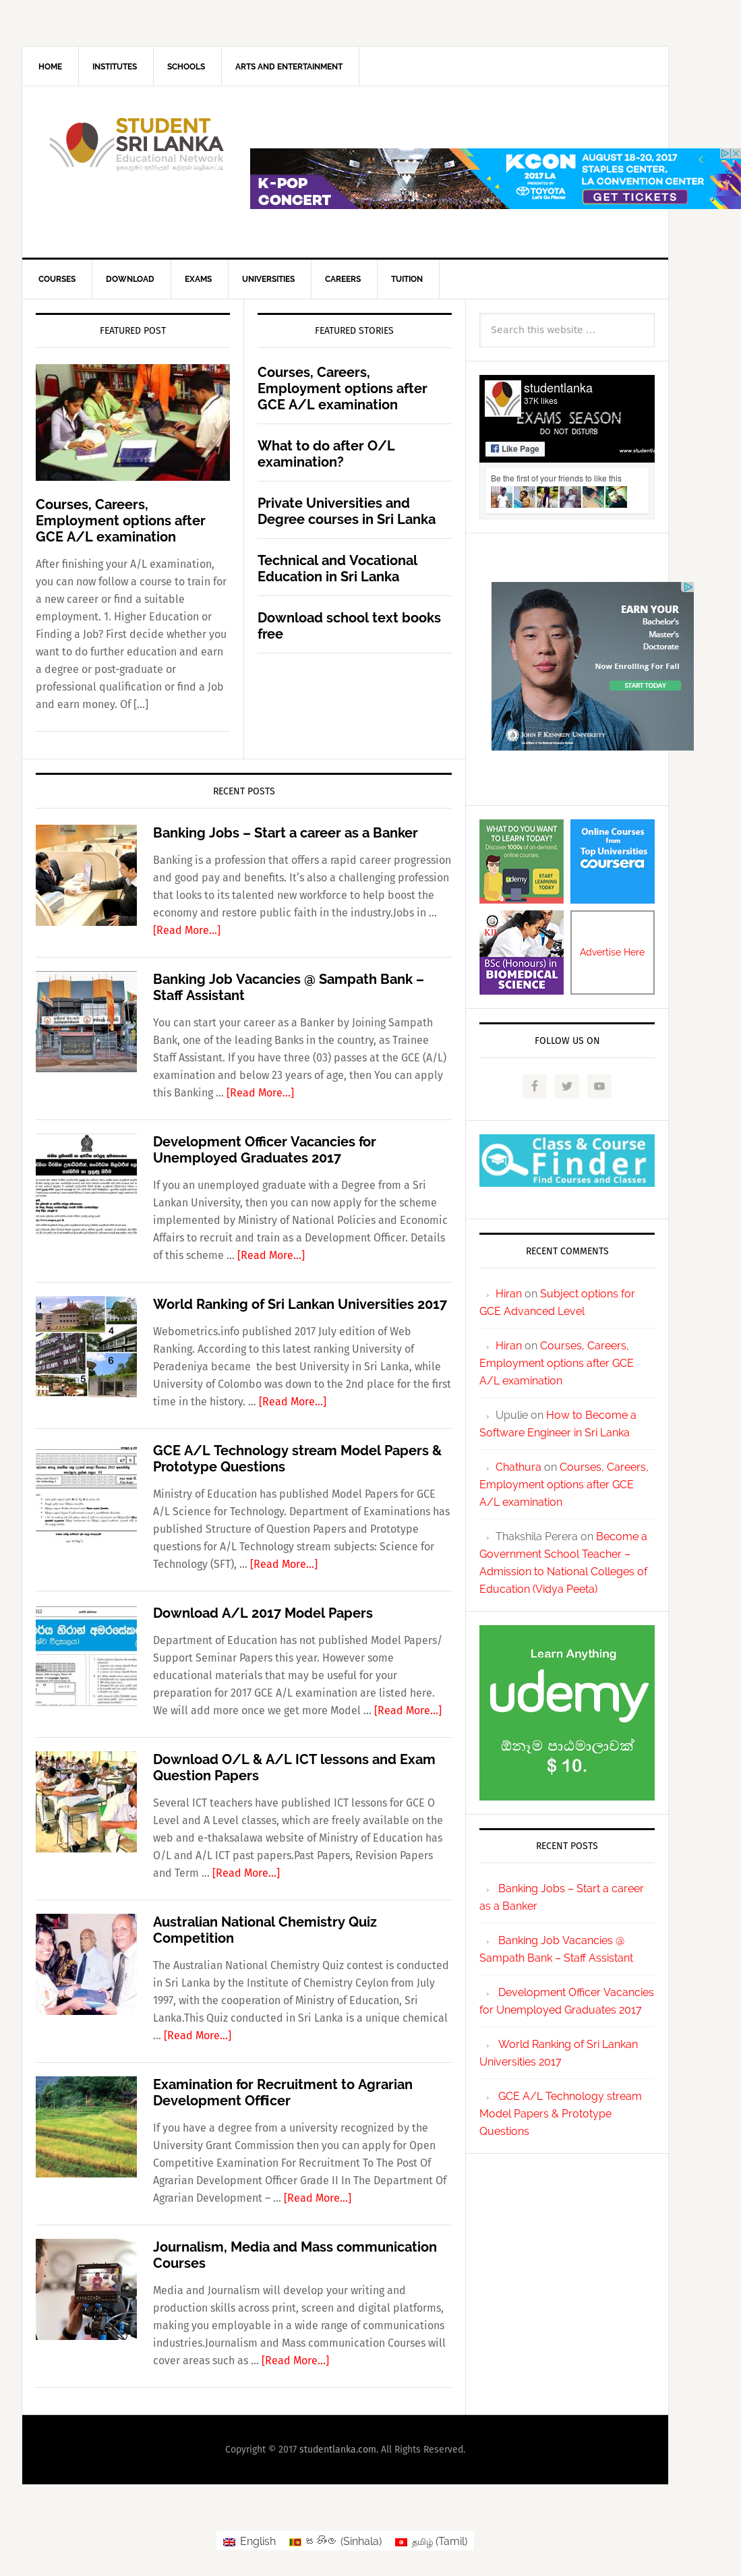 Studentlanka Competitors, Revenue and Employees - Owler Company Profile